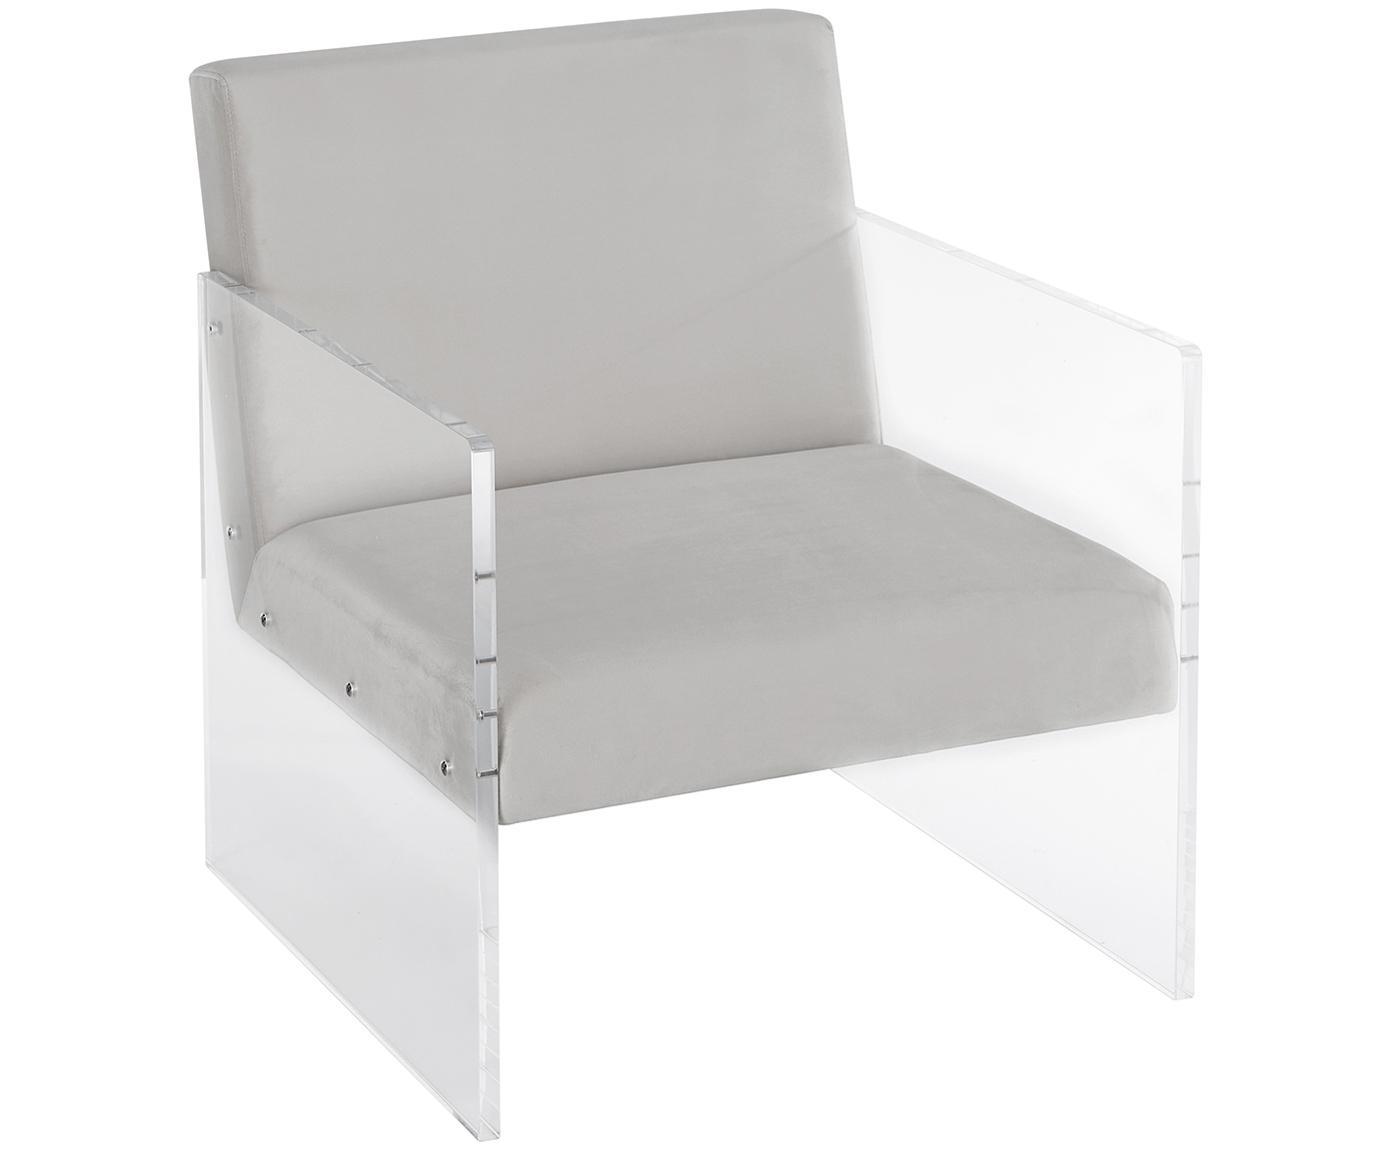 Fluwelen lounge fauteuil Ayden, Bekleding: fluweel (polyester), Frame: massief populierenhout, m, Poten: acrylglas, Fluweel lichtgrijs, B 64  x D 74 cm